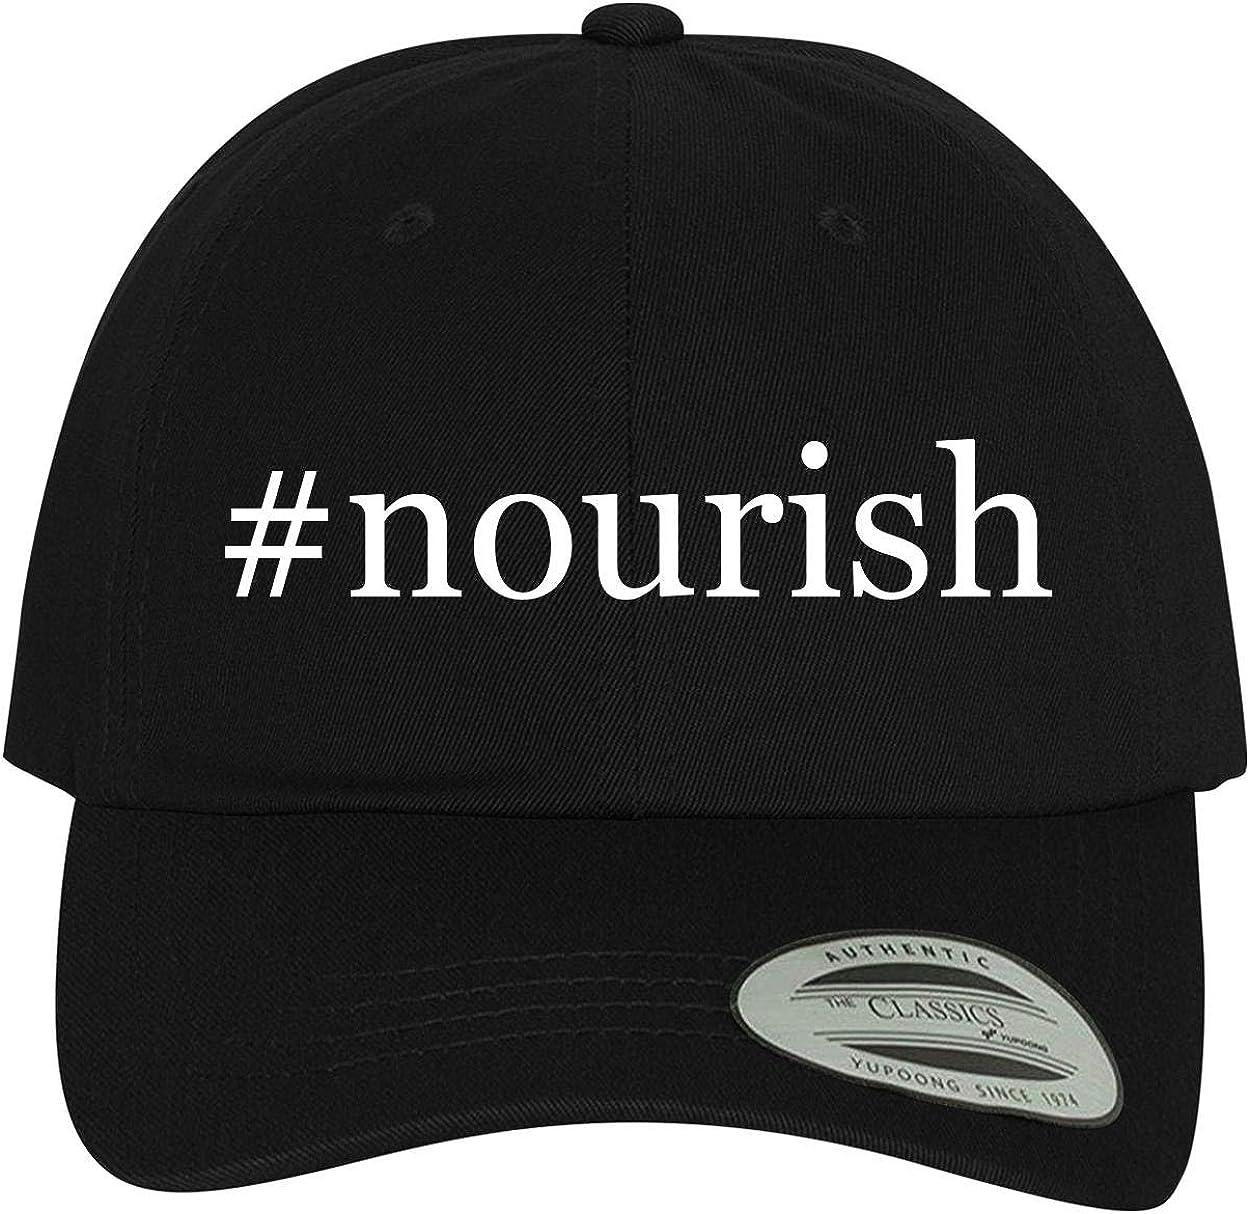 Comfortable Dad Hat Baseball Cap #Nourish